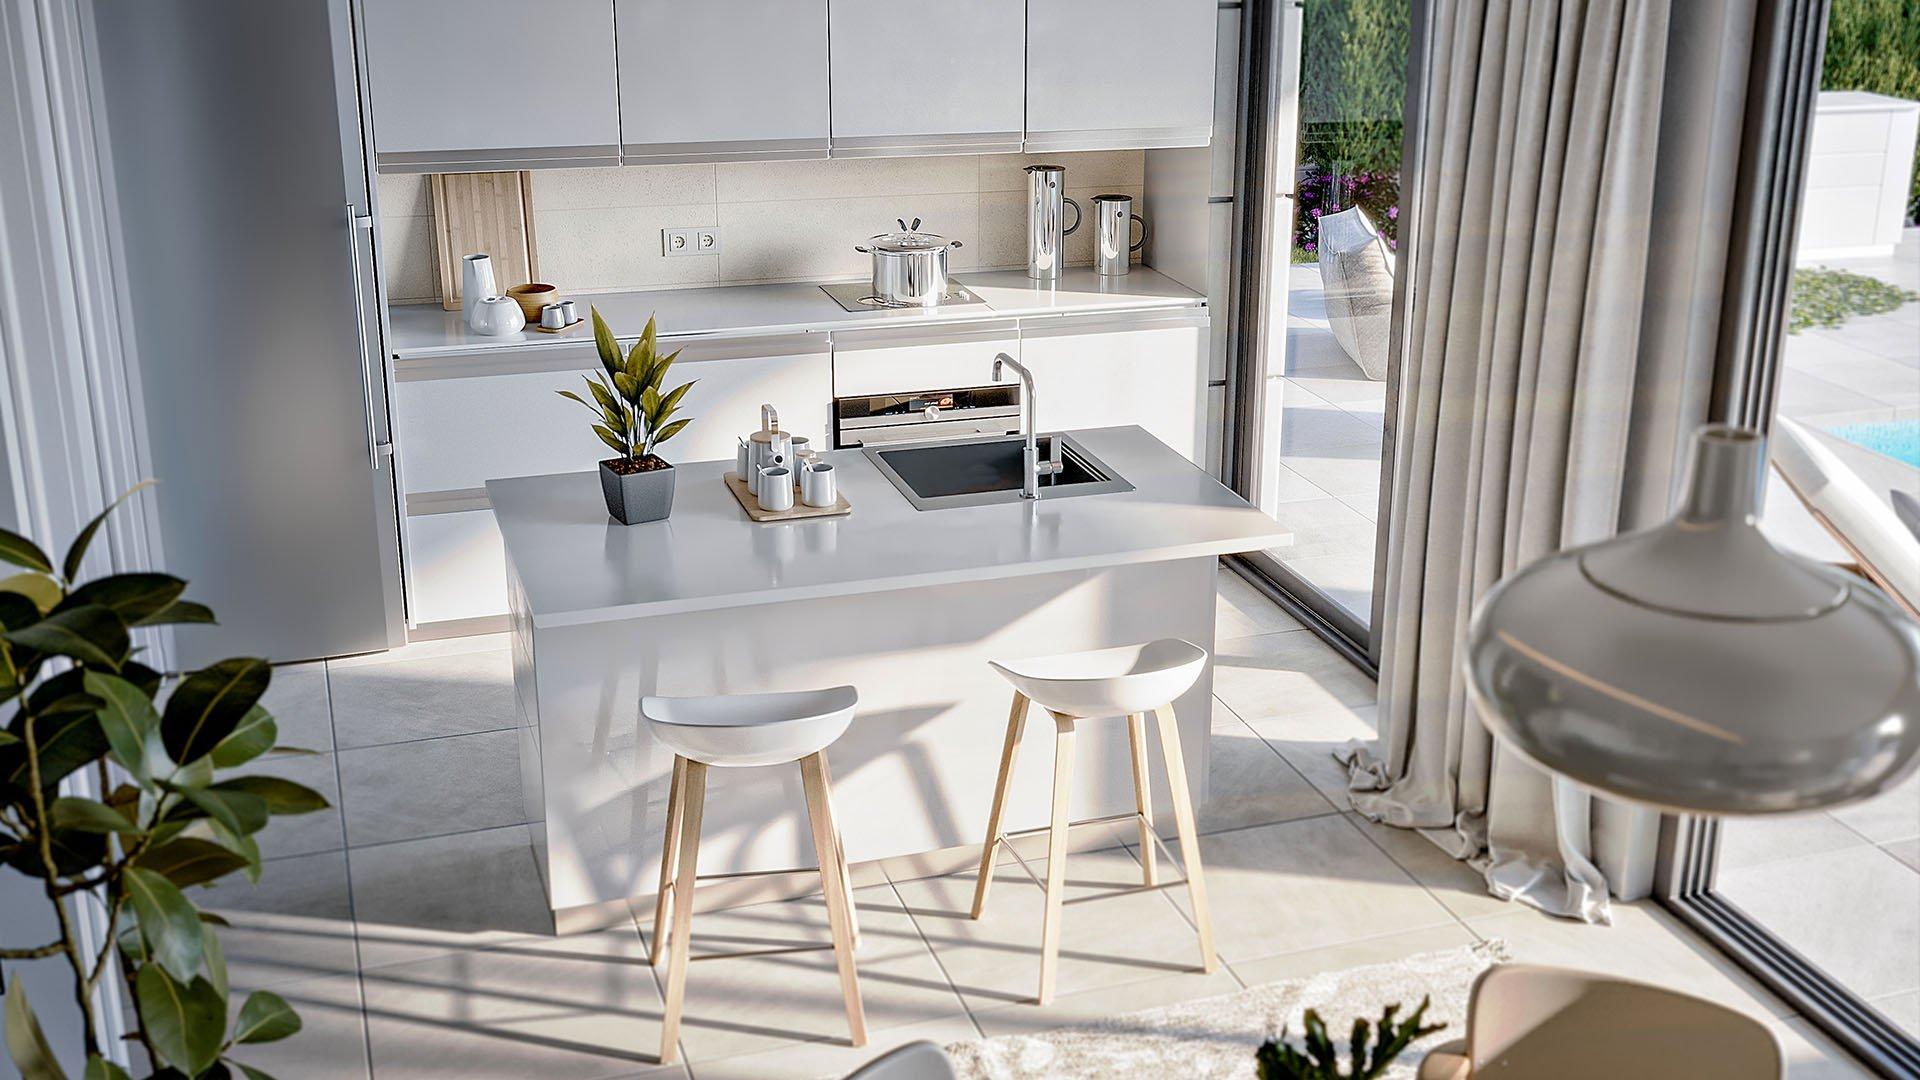 Duquesa Valley: Affordable modern villas in La Duquesa